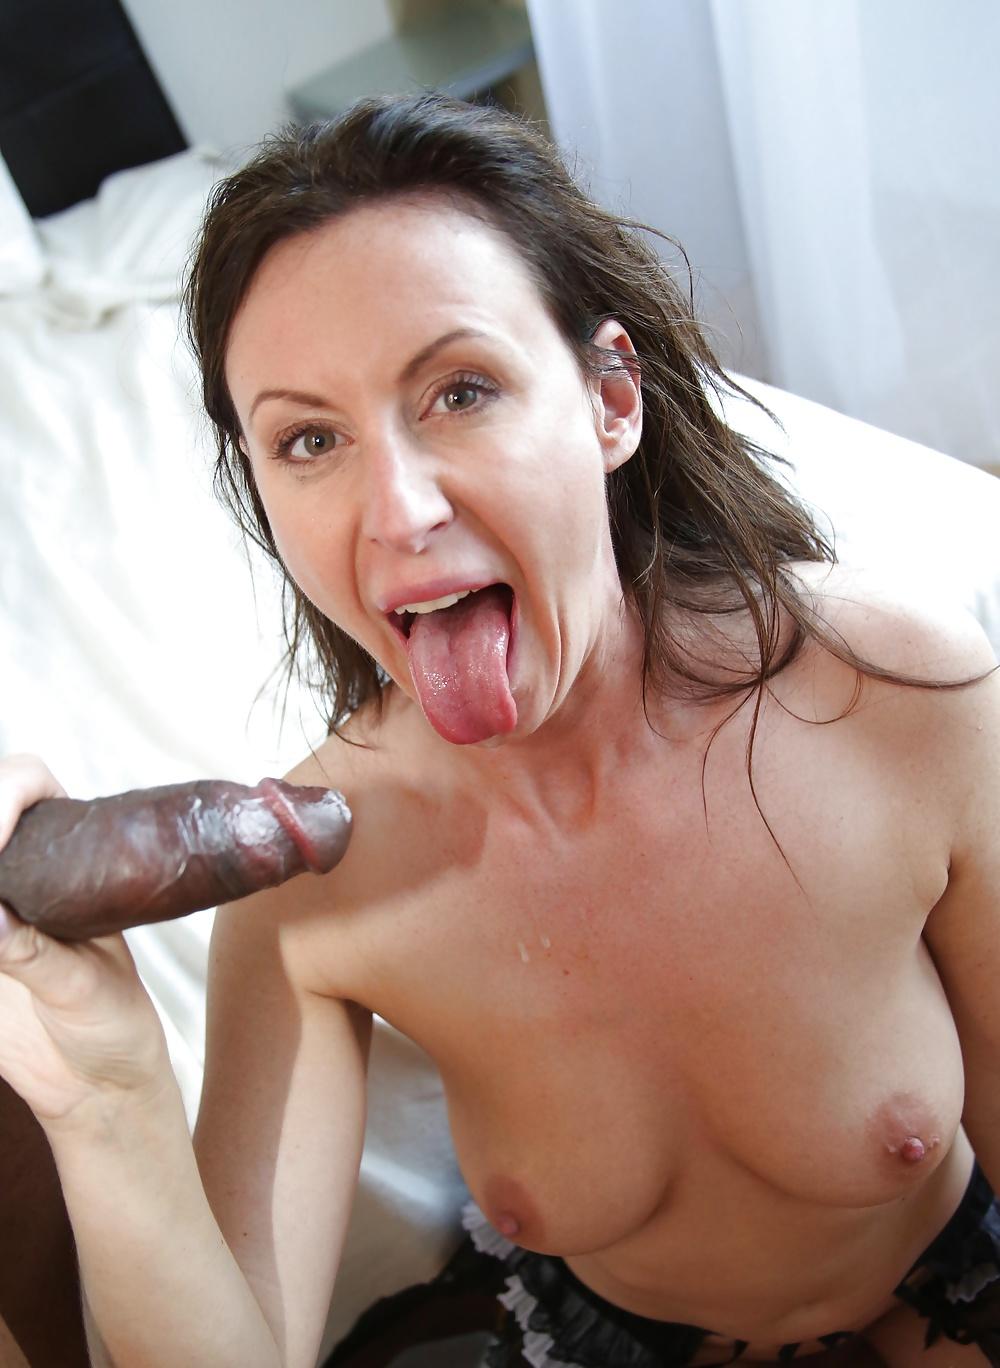 big tit latina cheating wife